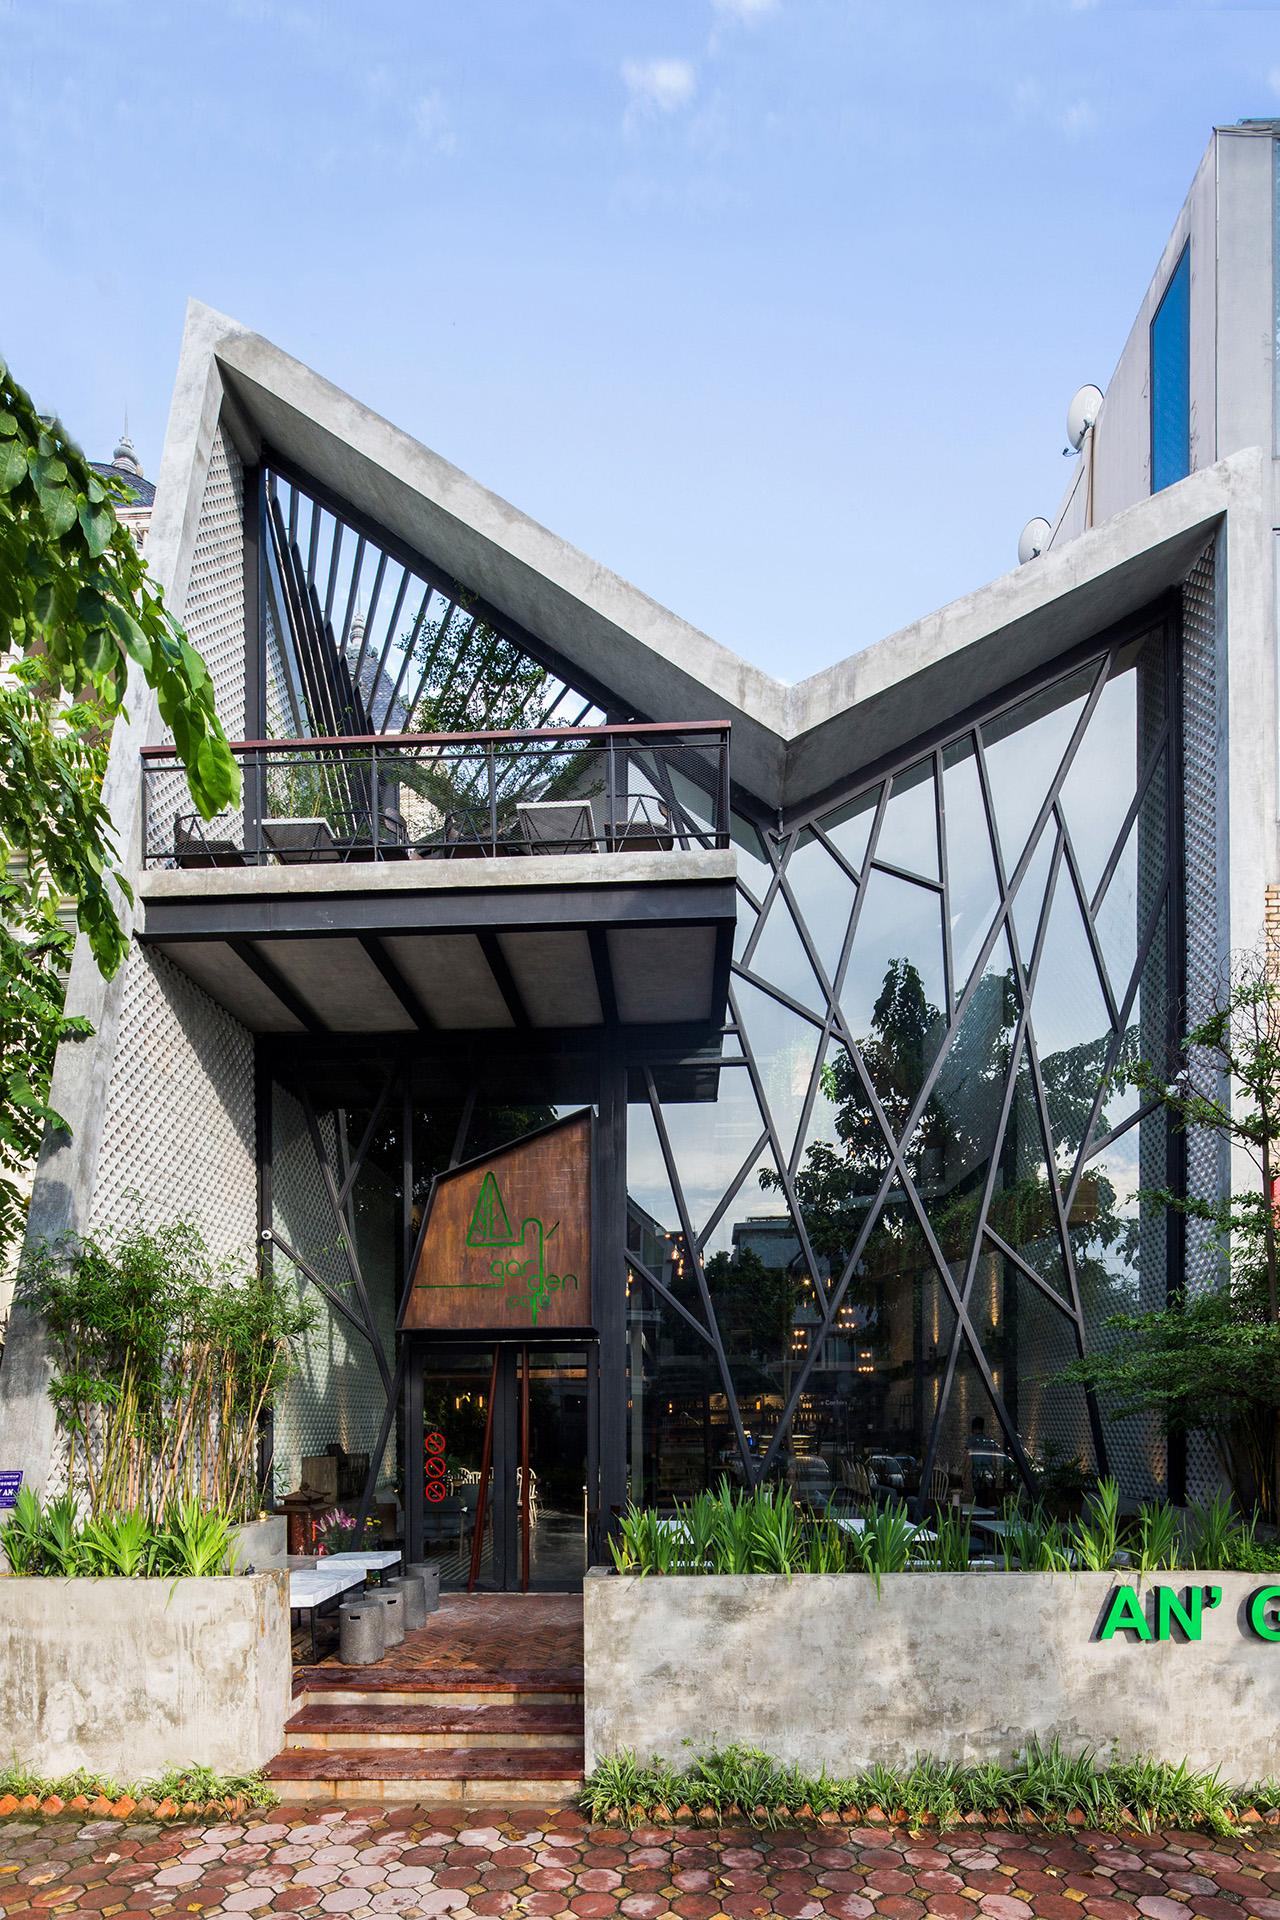 an-garden-cafe-le-house-architecture-public-and-leisure-vietname-hanoi_dezeen_2364_col_7_1280px.jpg